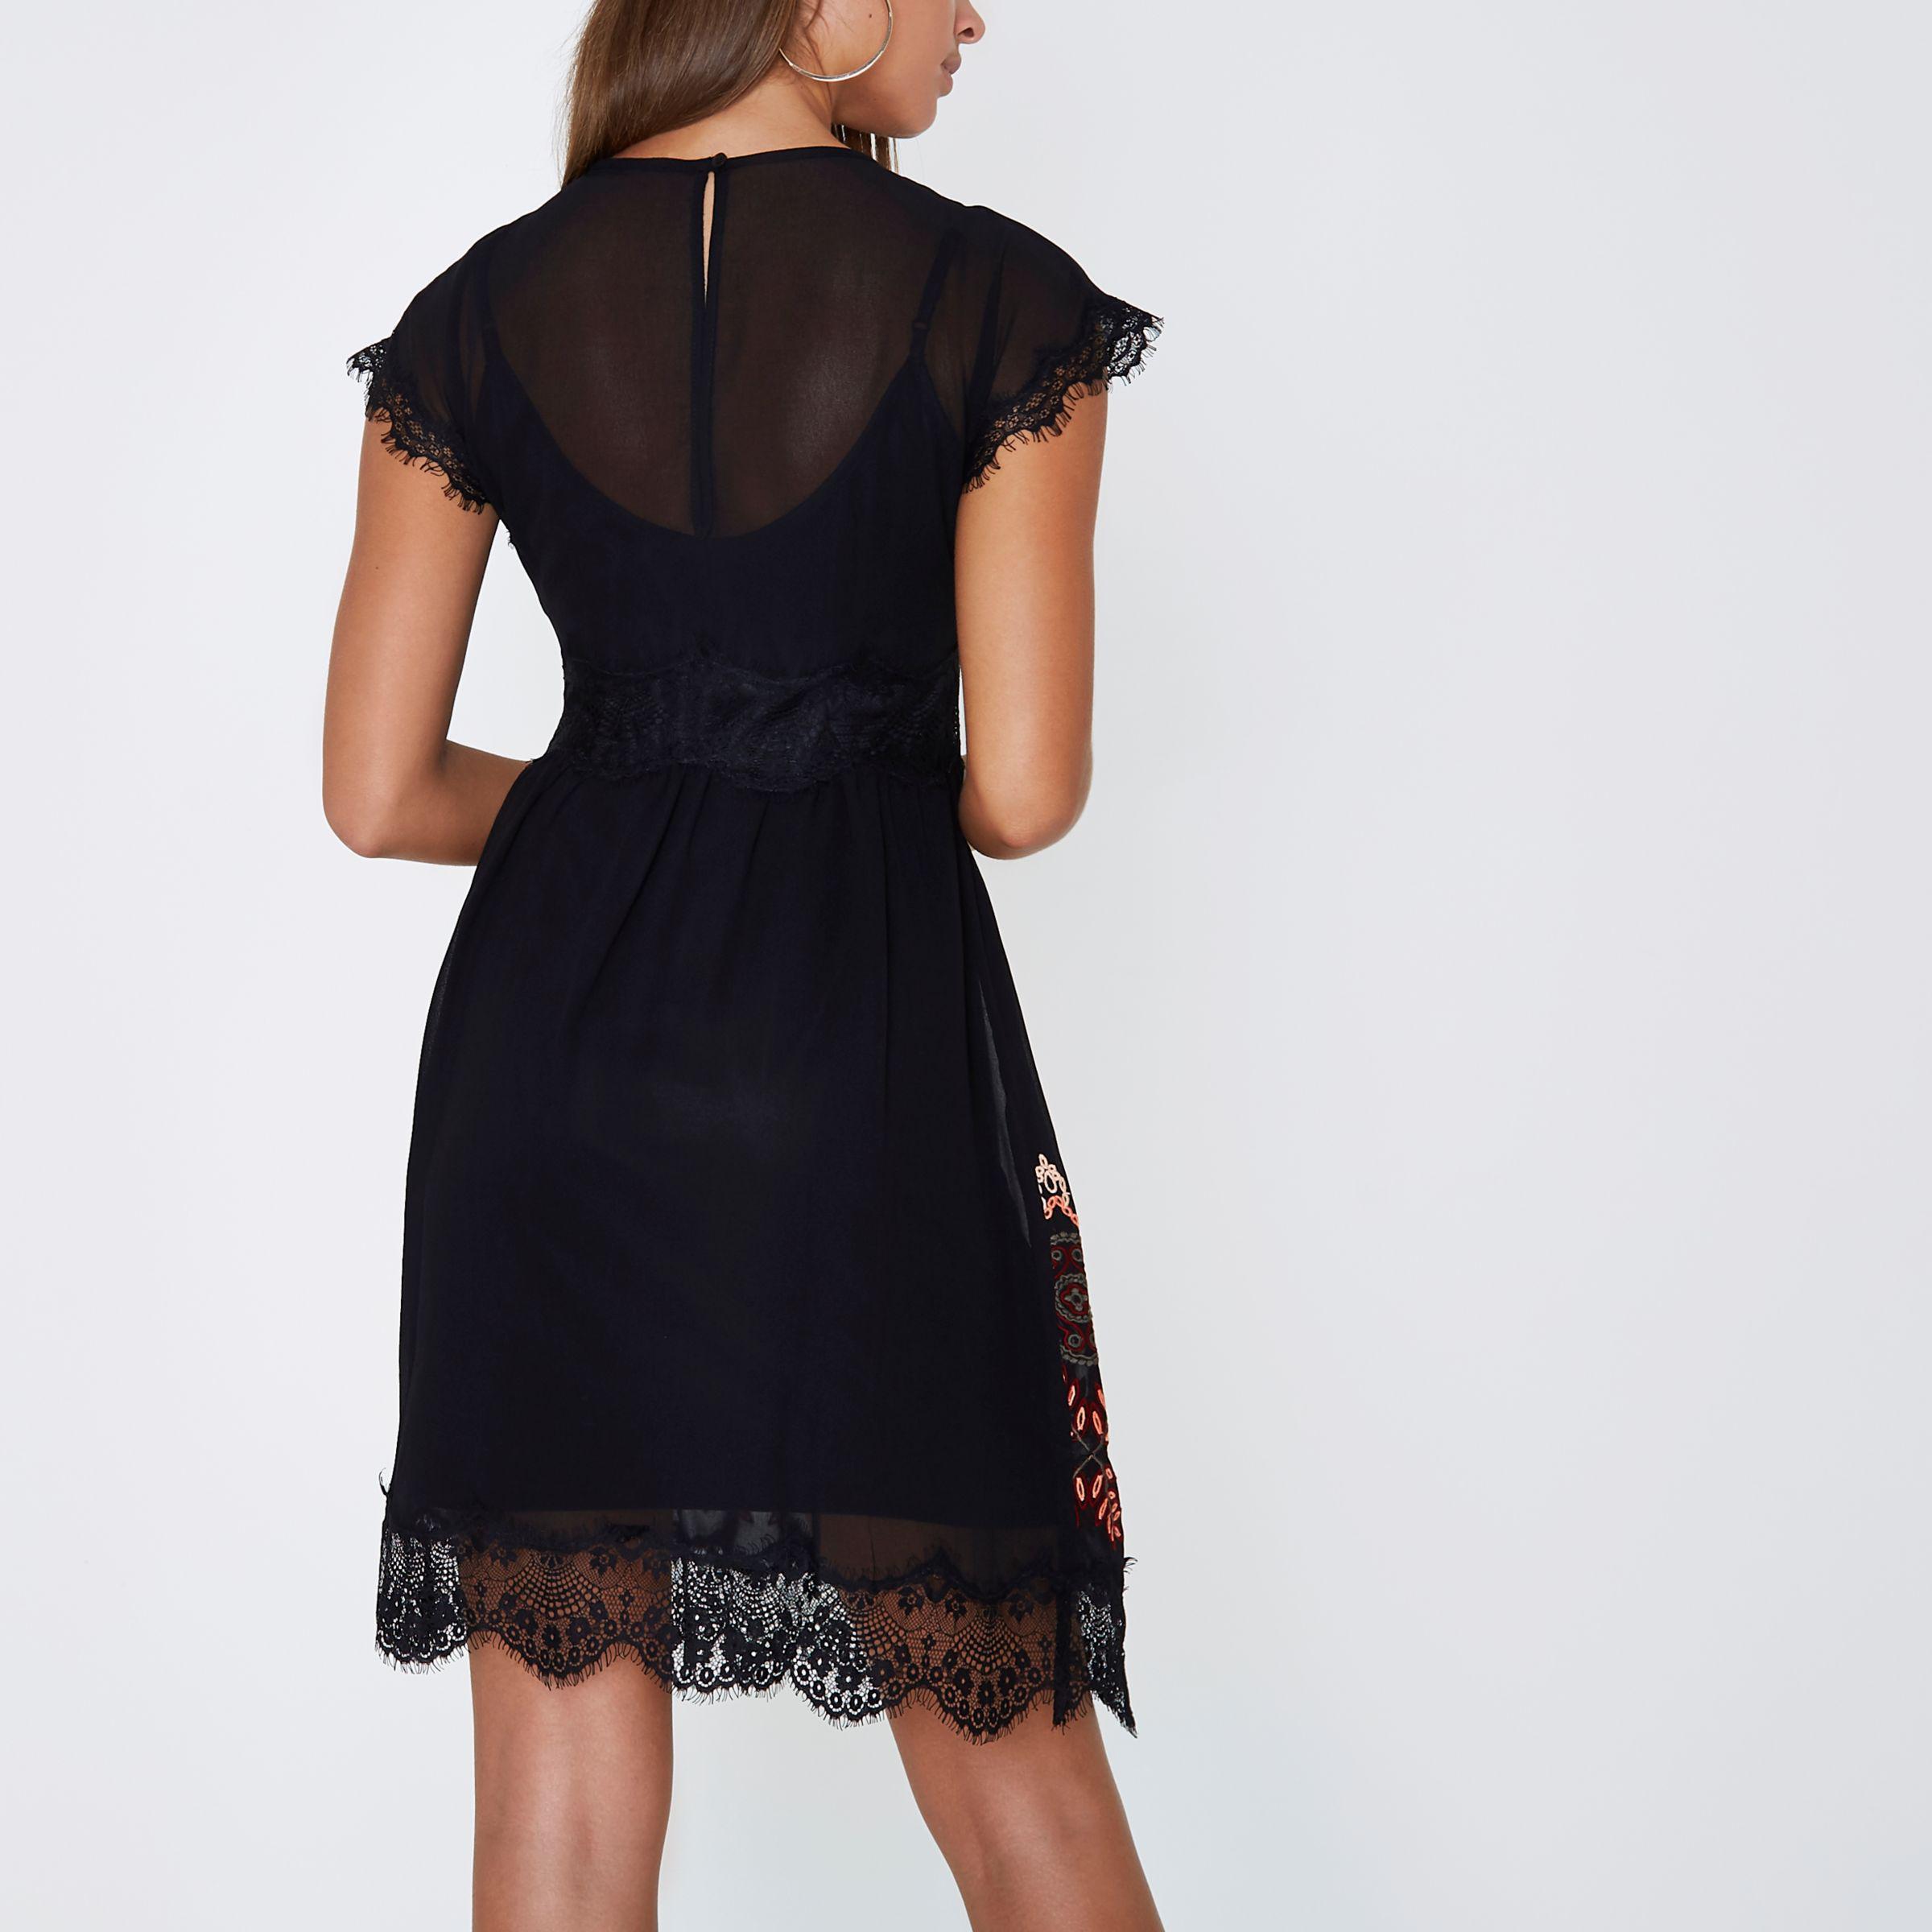 1bf64b9dba07 Lyst - River Island Black Embroidered Eyelash Lace Swing Dress in Black